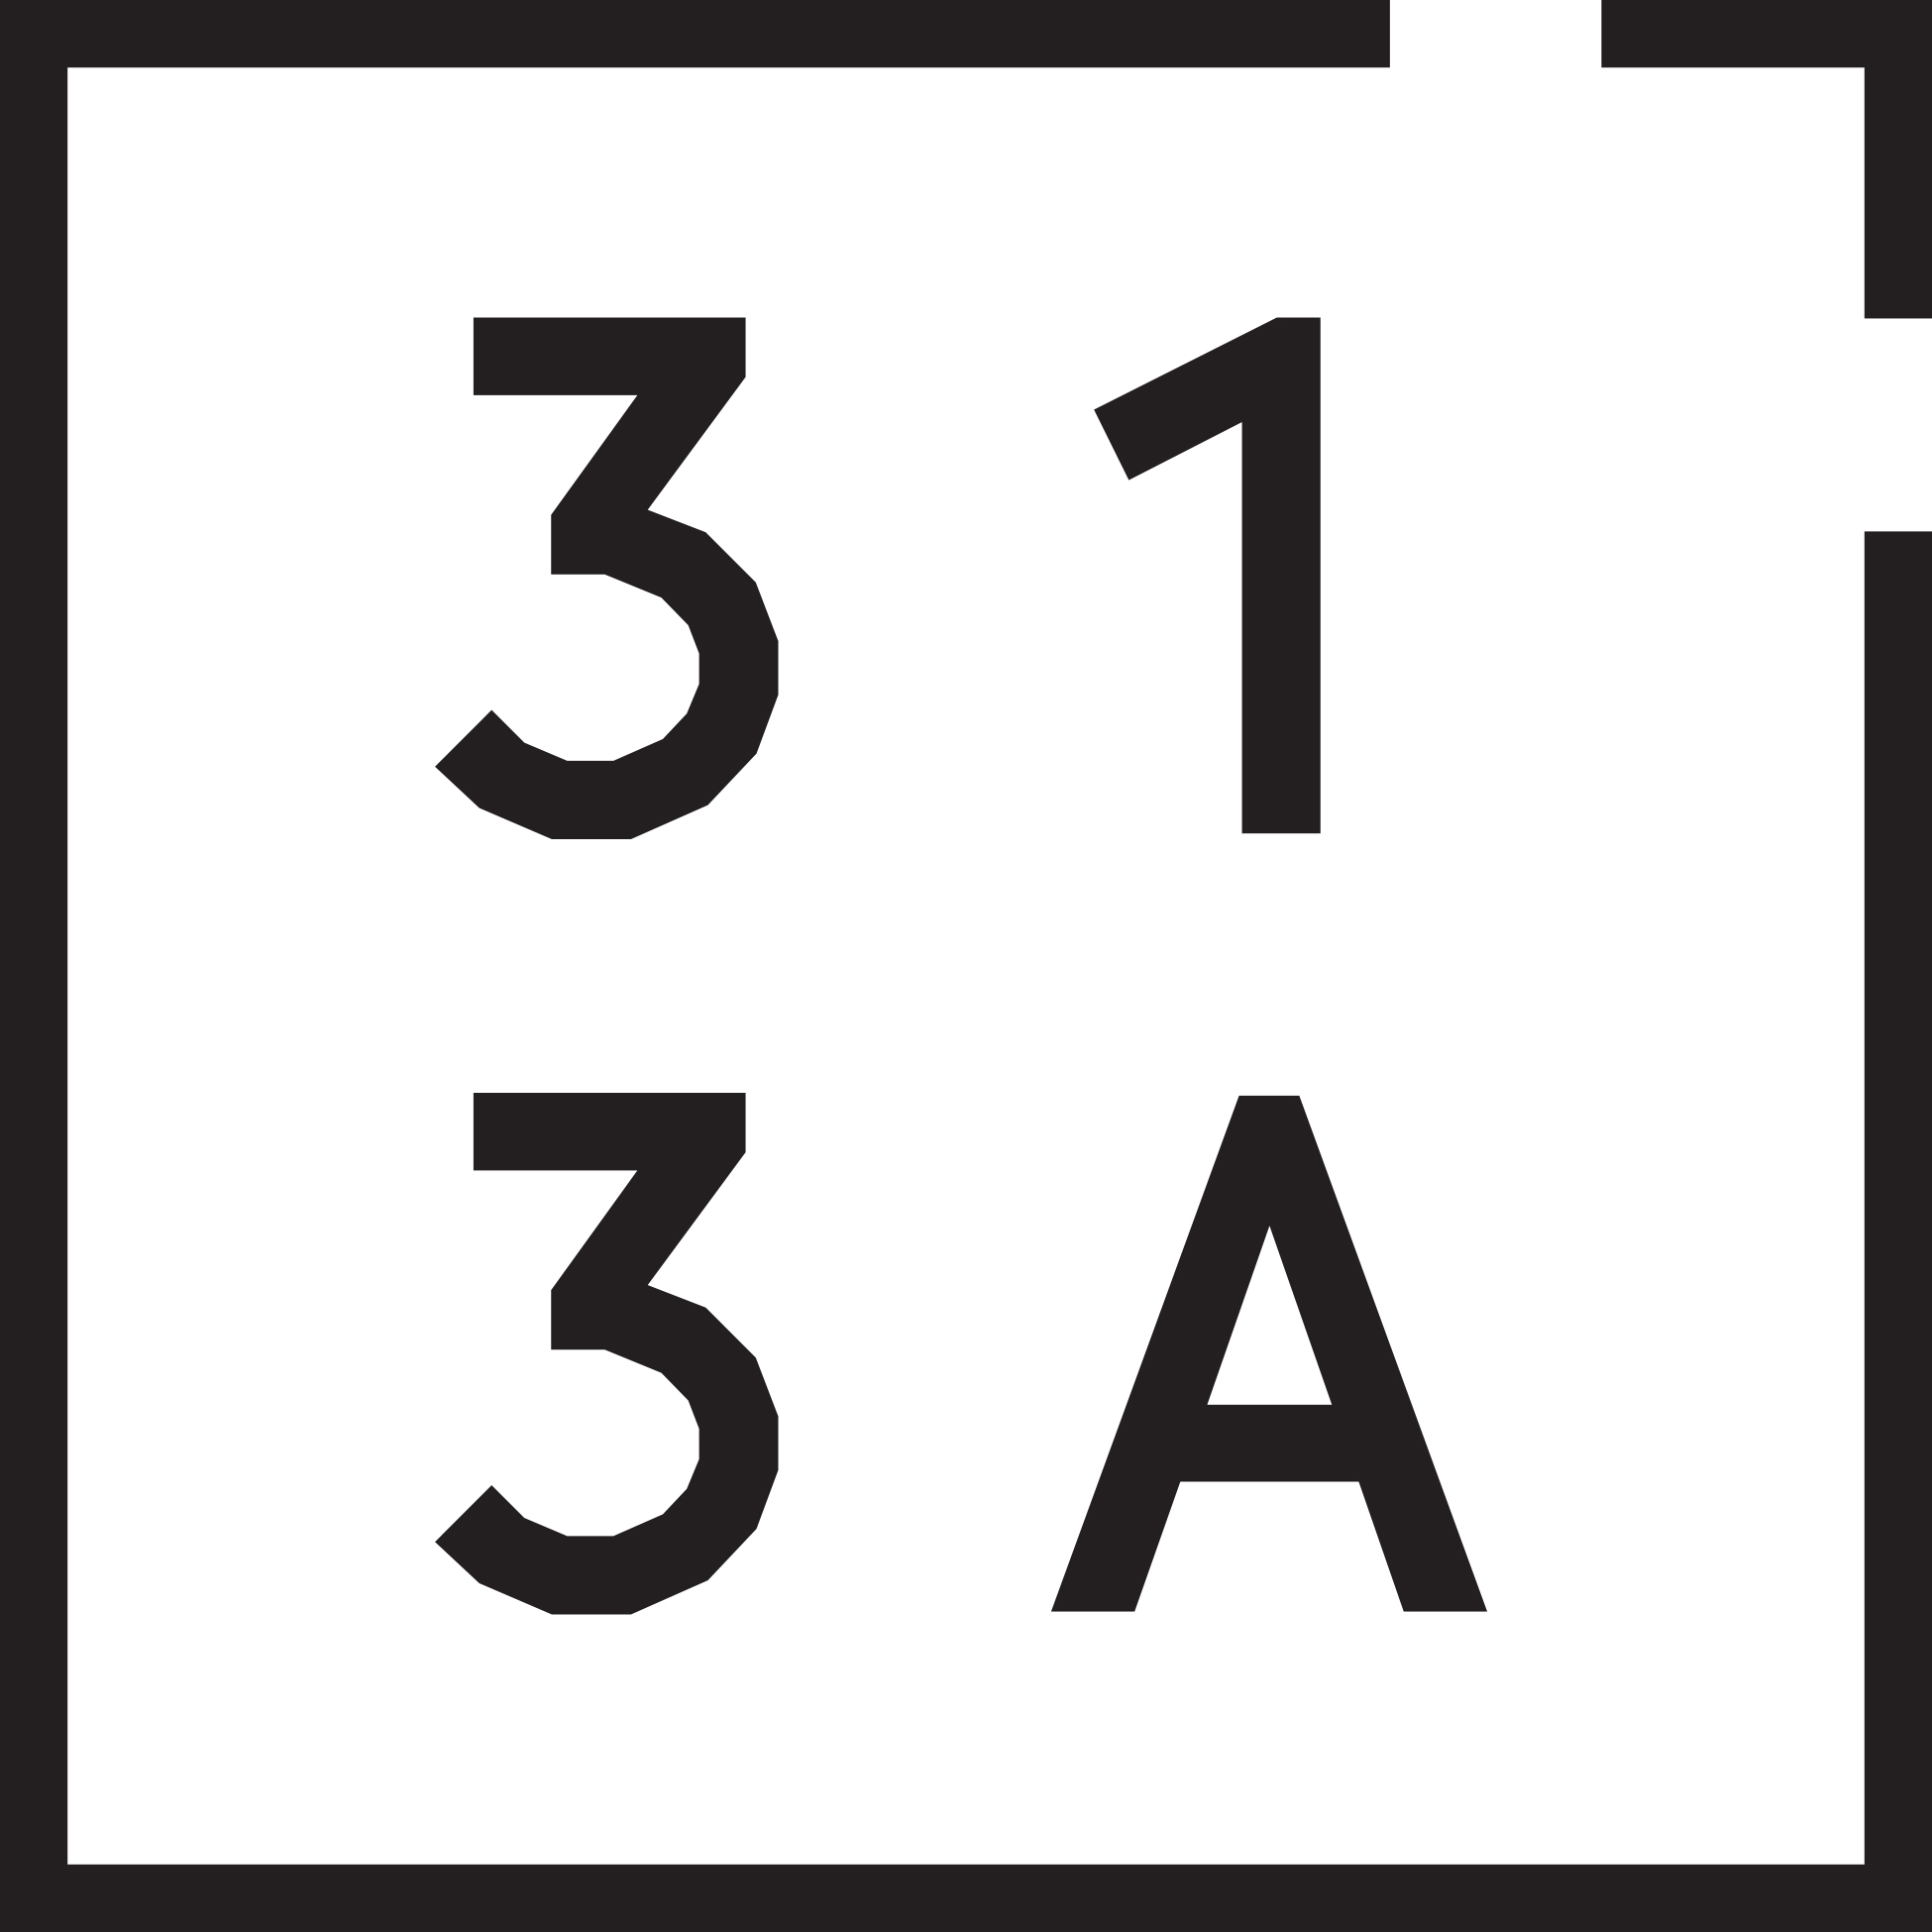 313 architects